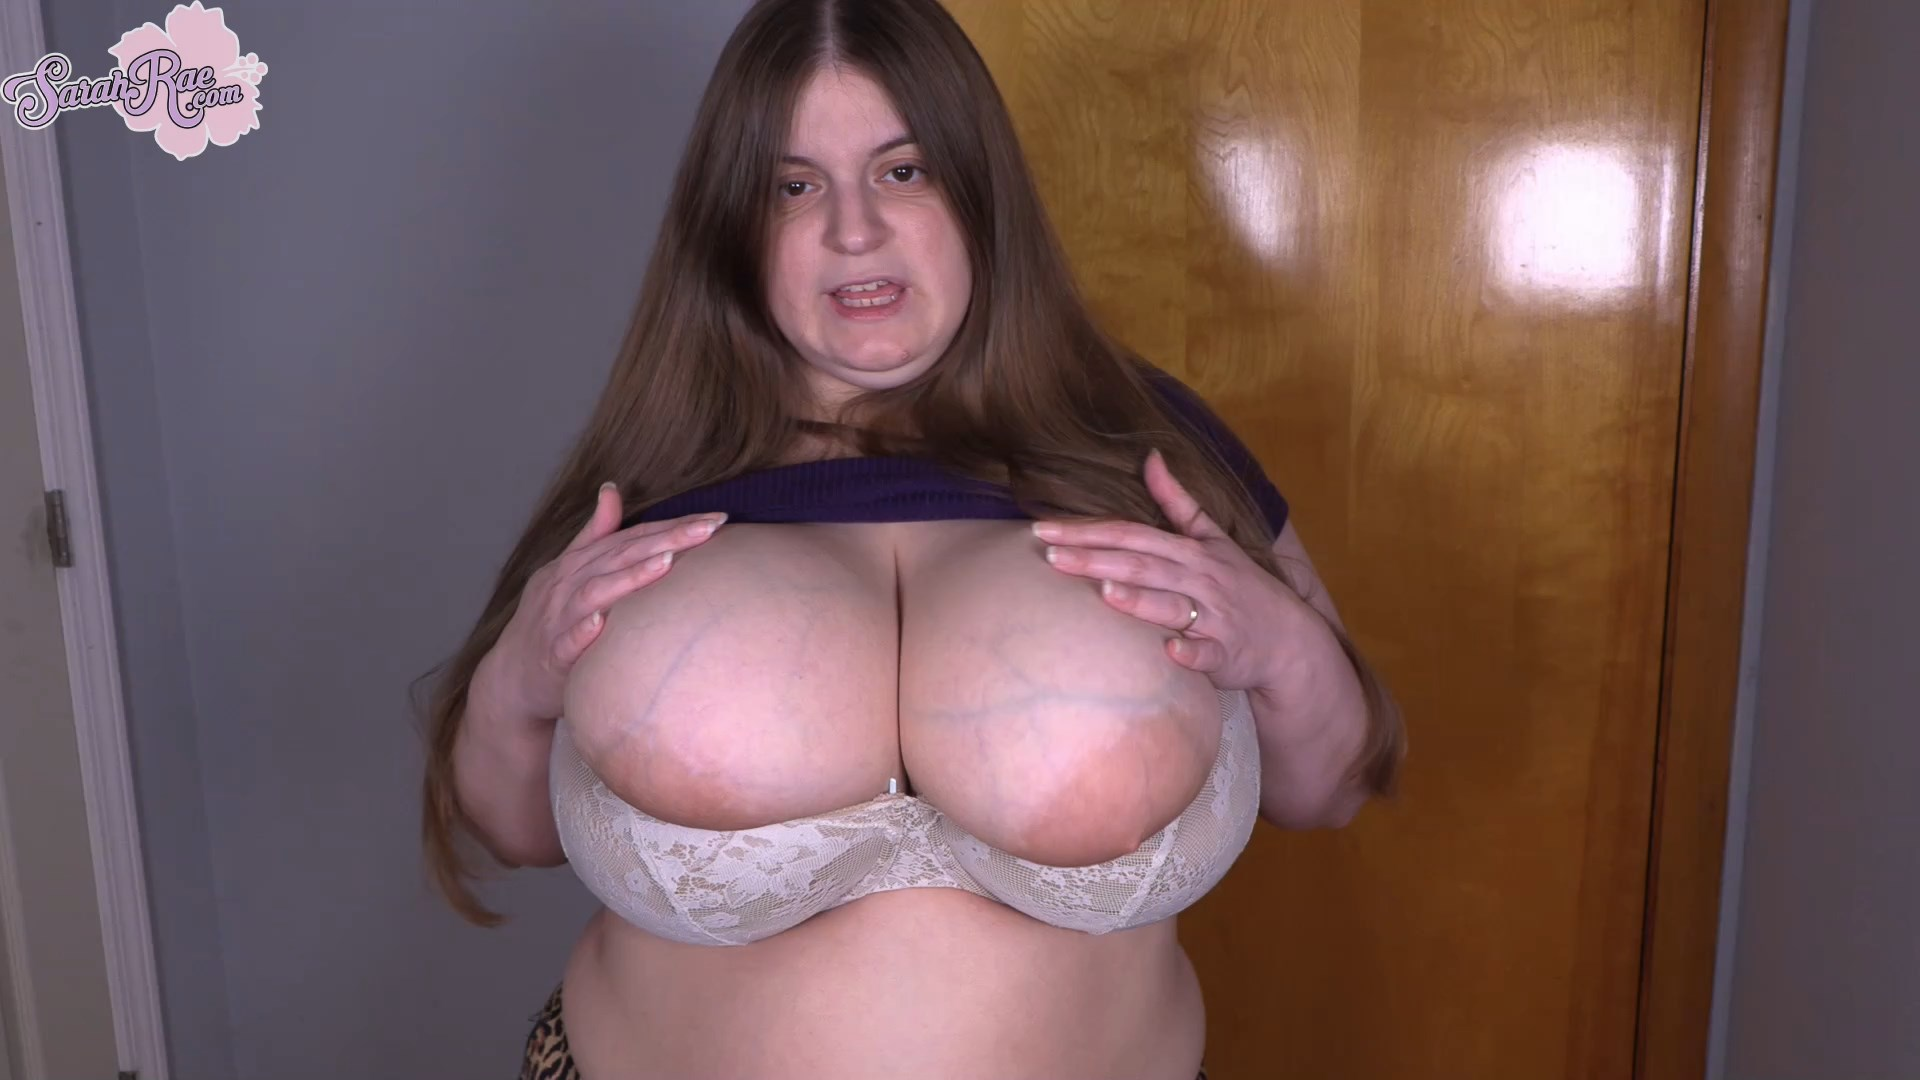 Sarah Rae - Mom Catches You Masturbating